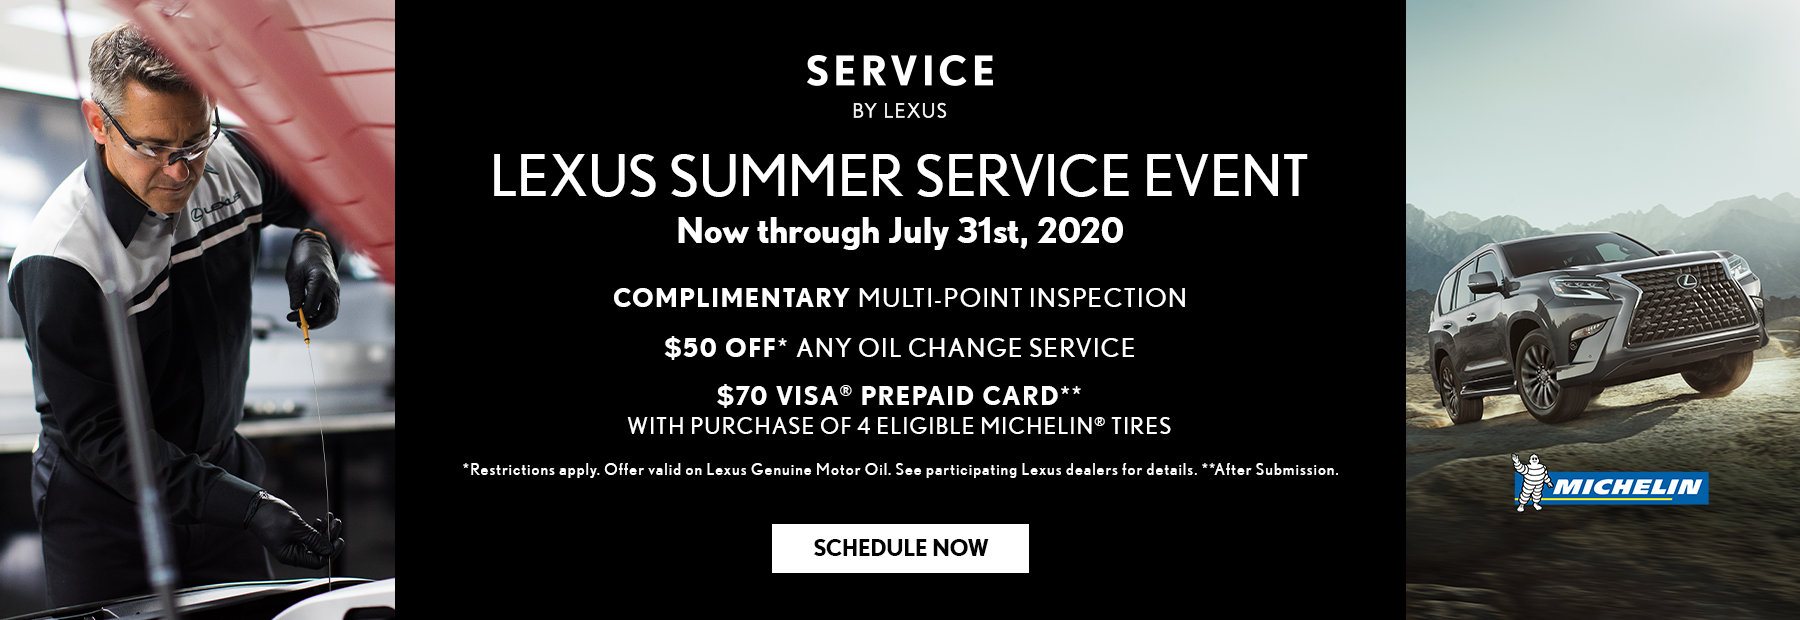 Lexus summer service event. Ends July 31st.